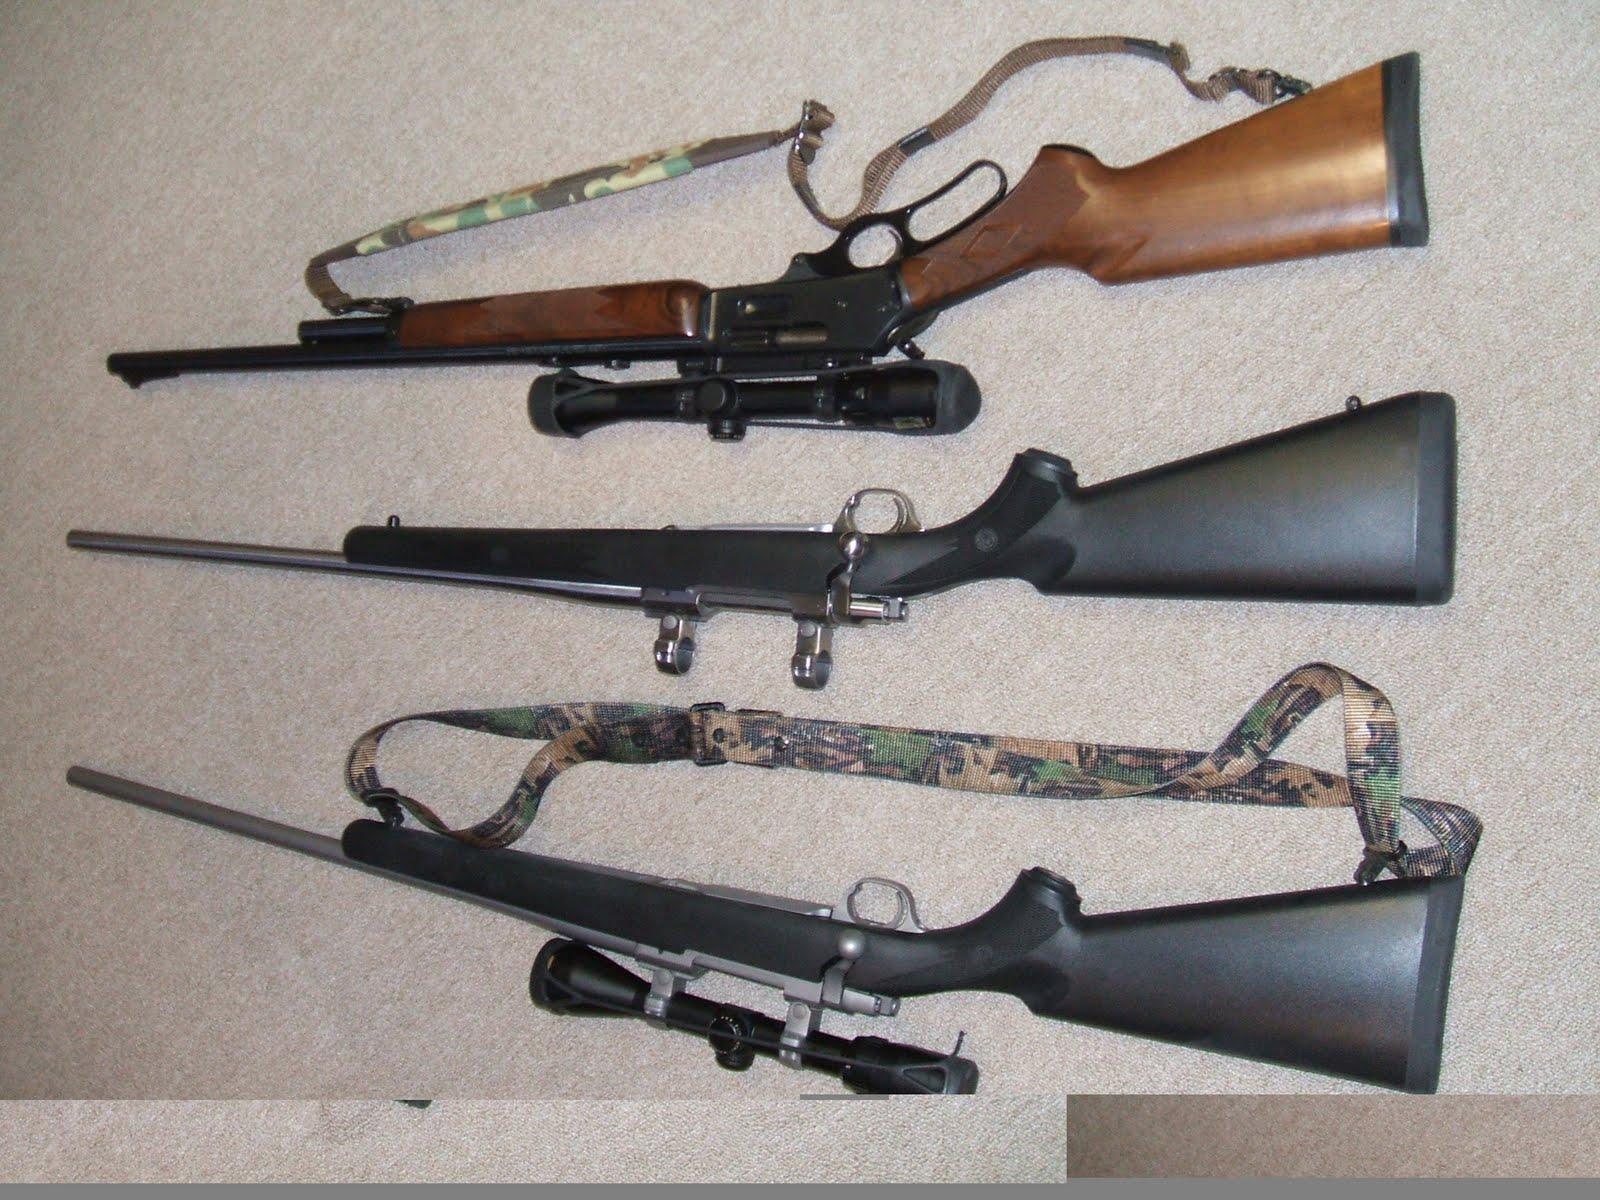 GunsAndOptics: 3 Rifles and 4 Loads for Bear Hunting